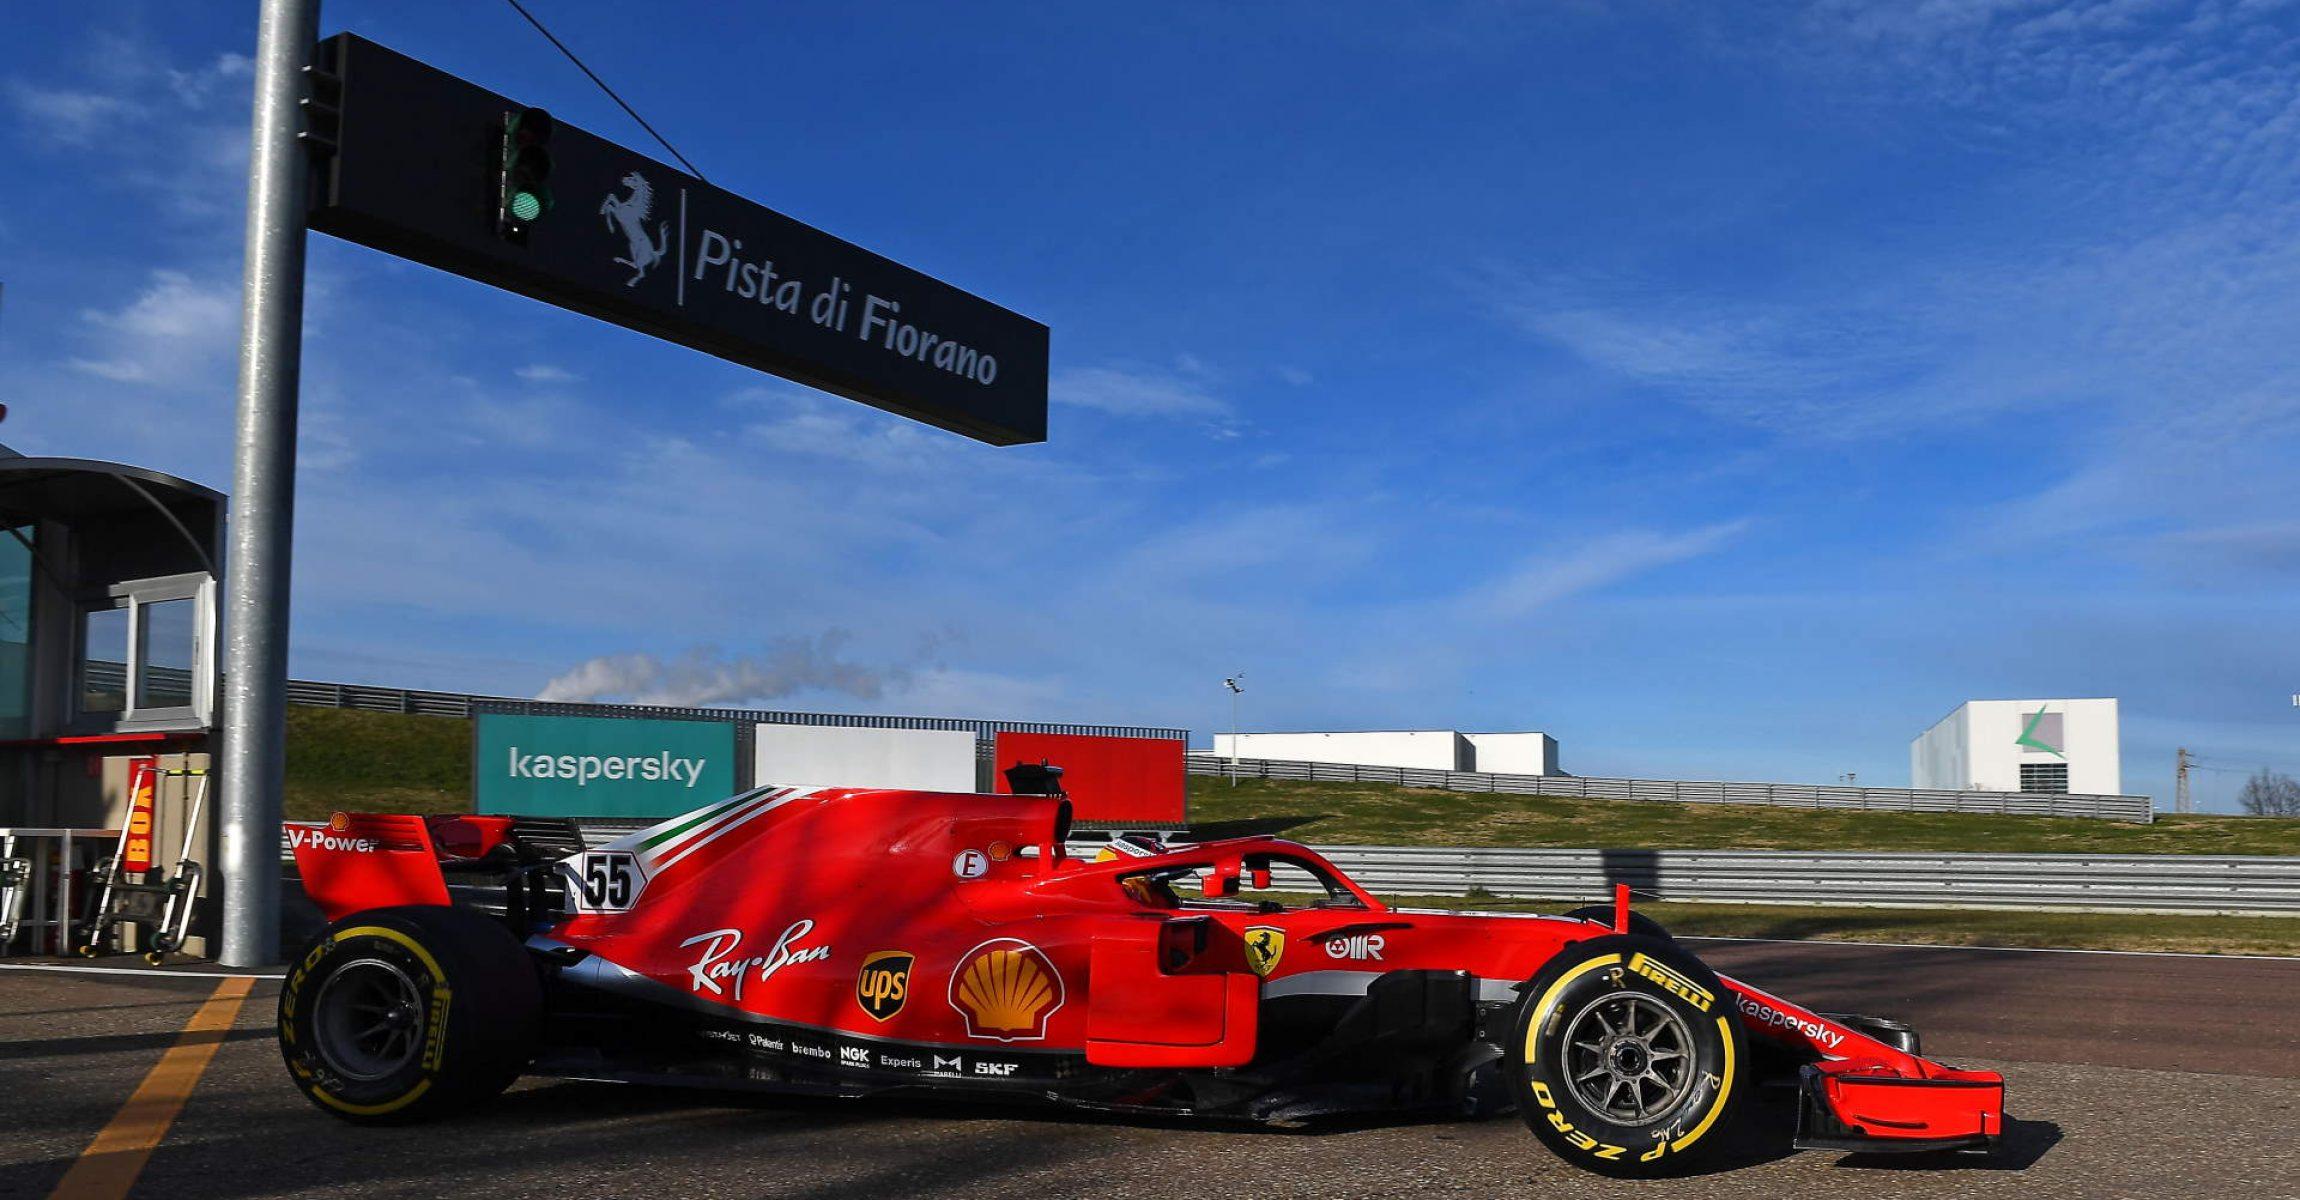 FERRARI F1 TEST FIORANO - MERCOLEDI 27/01/2021 credit: @Scuderia Ferrari Press Office Carlos Sainz